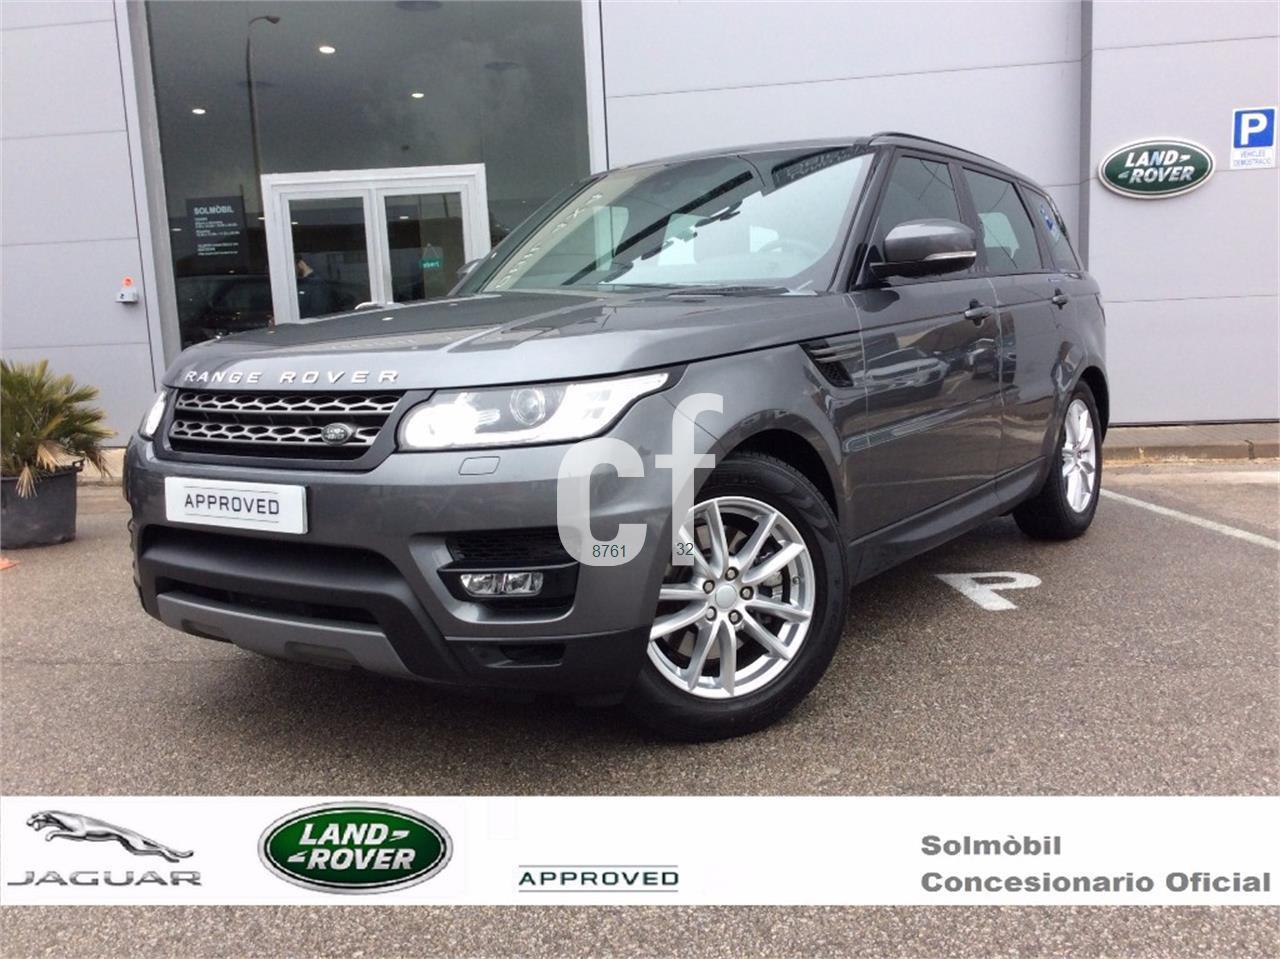 LAND-ROVER Range Rover Sport de venta de venta por 69843